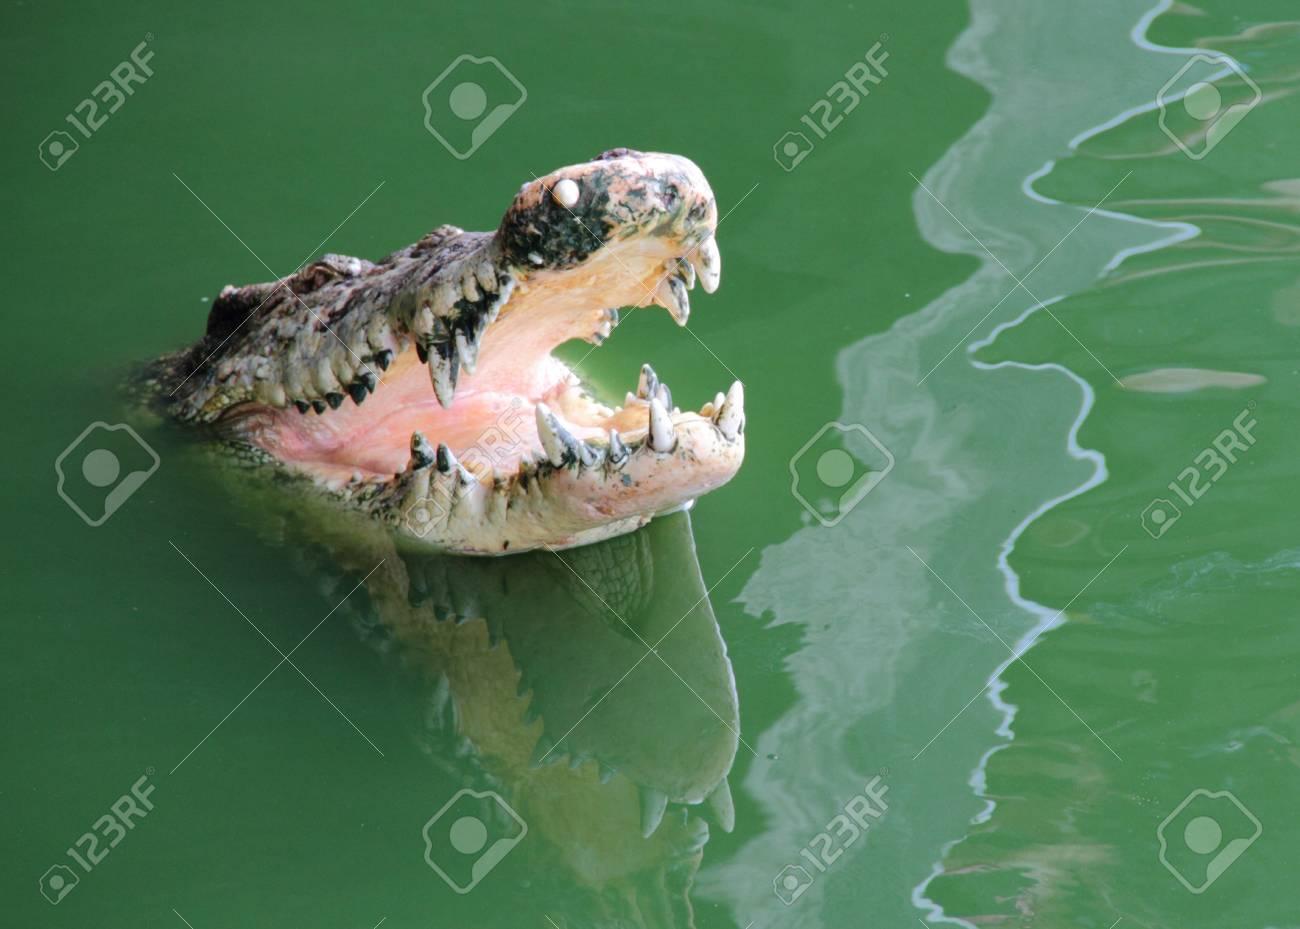 Crocodile in water Stock Photo - 13734929